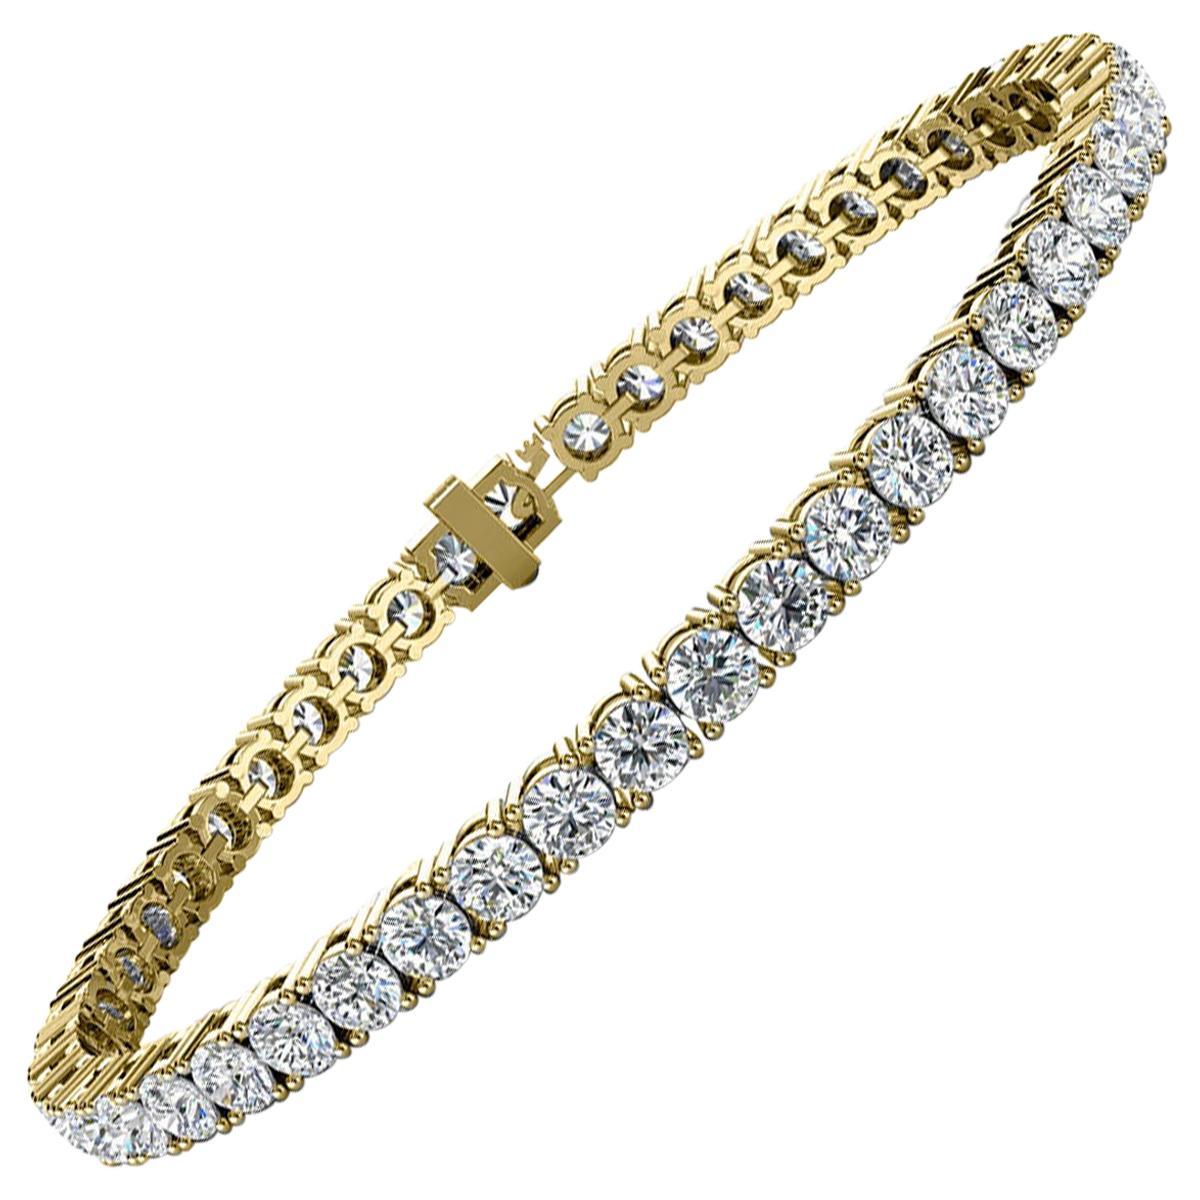 14 Karat Yellow Gold Four Prongs Diamond Tennis Bracelet '7 Carat'